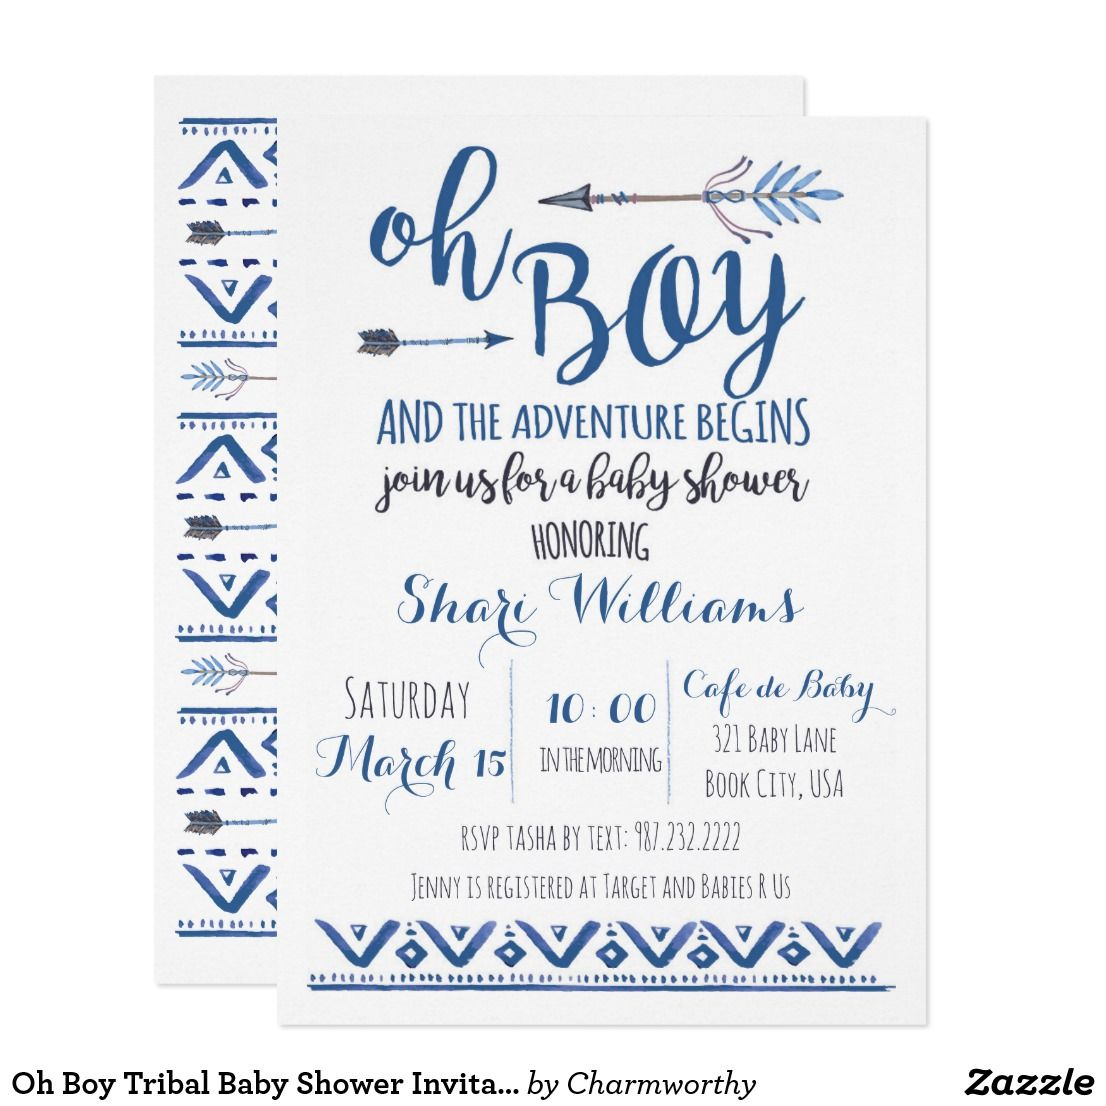 Oh Boy Tribal Baby Shower Invitation -CUSTOM | Tribal baby shower ...